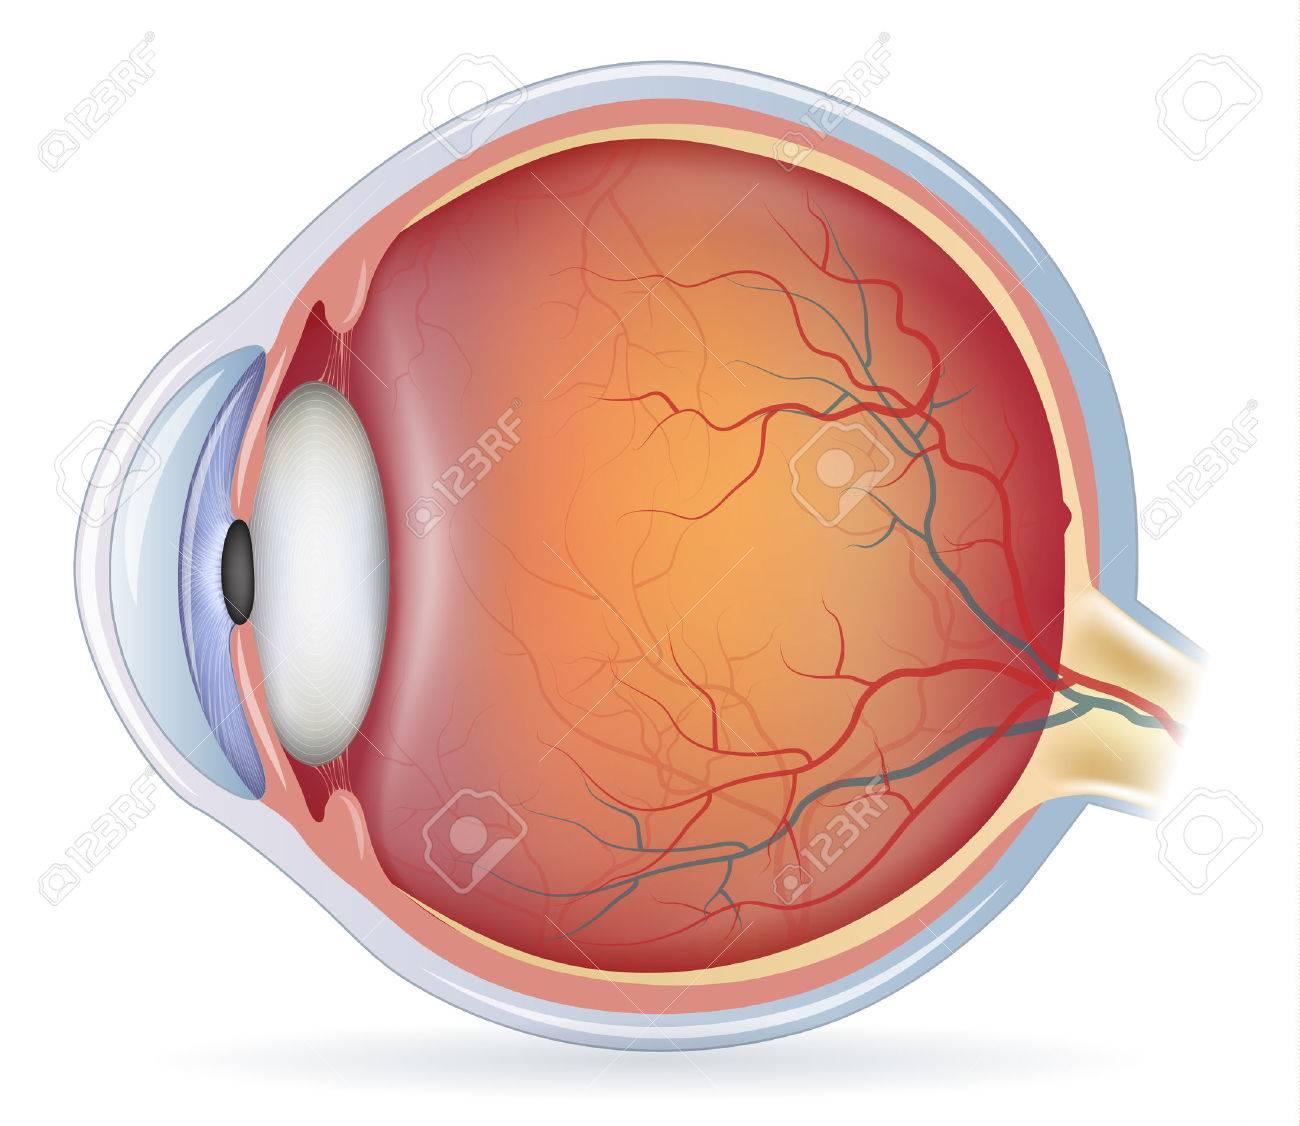 Human Eye Anatomy, Detailed Illustration. Isolated On A White ...